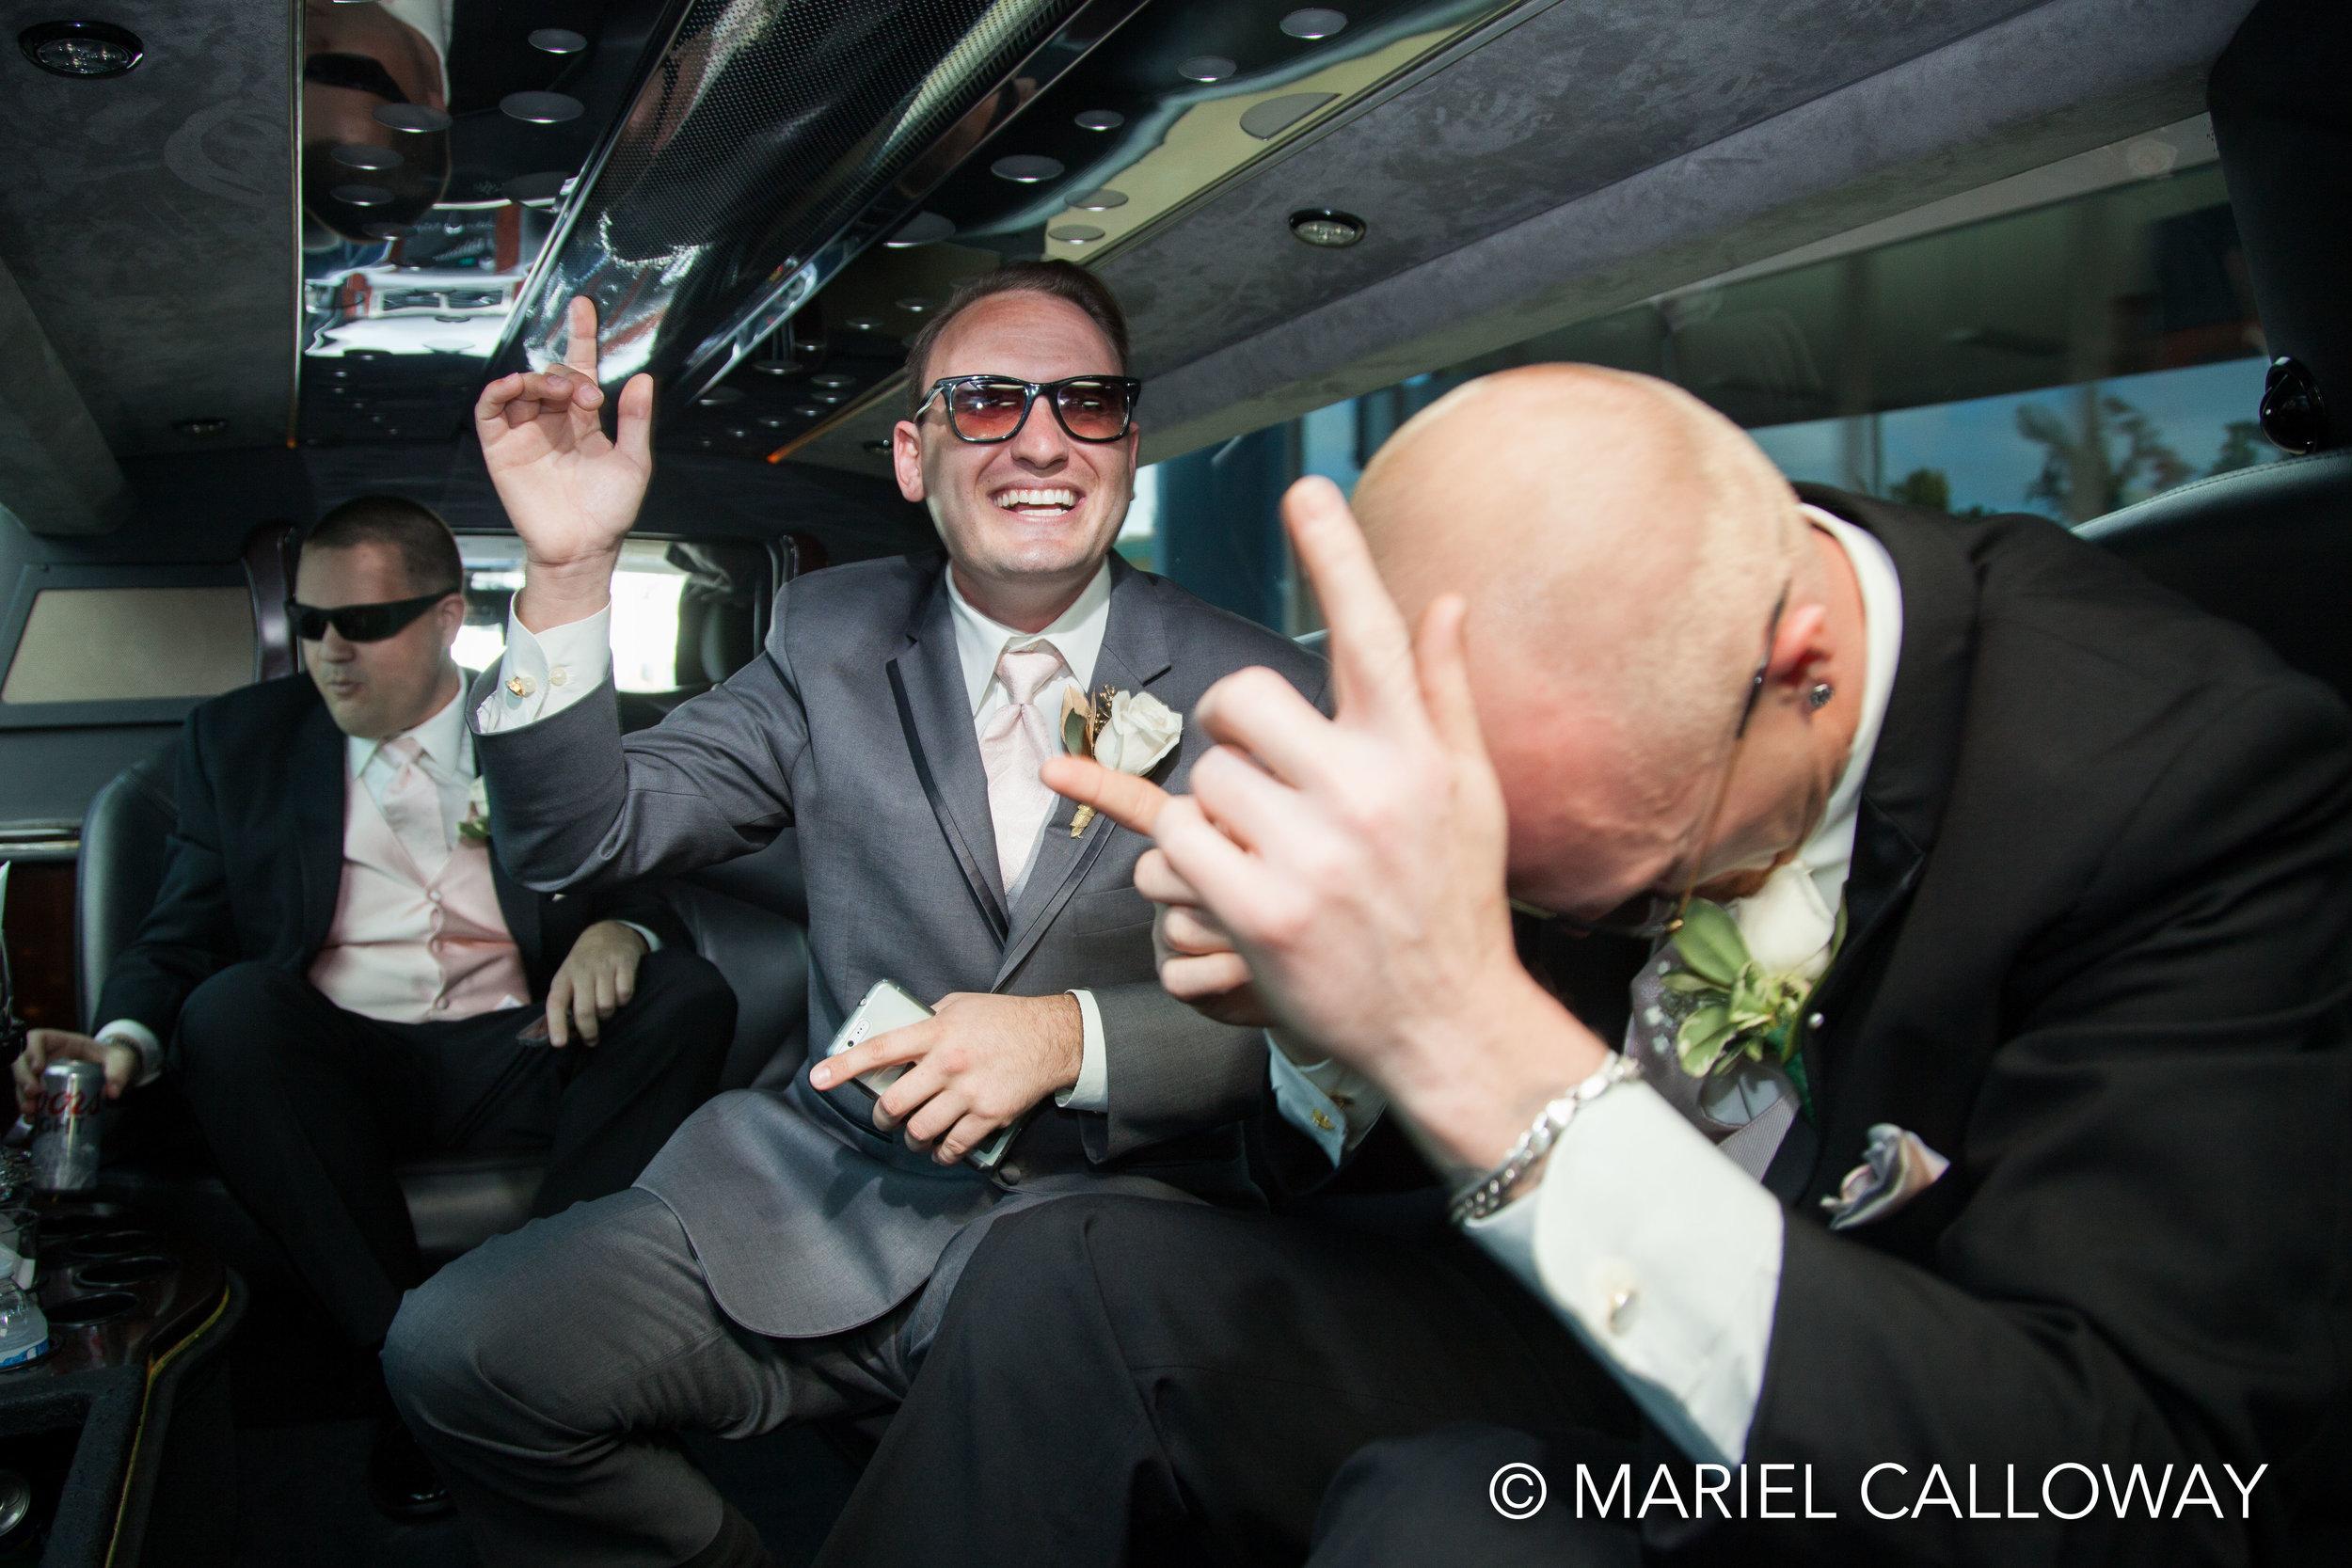 Mariel-Calloway-Los-Angeles-Wedding-Photography-Rossi-32.jpg